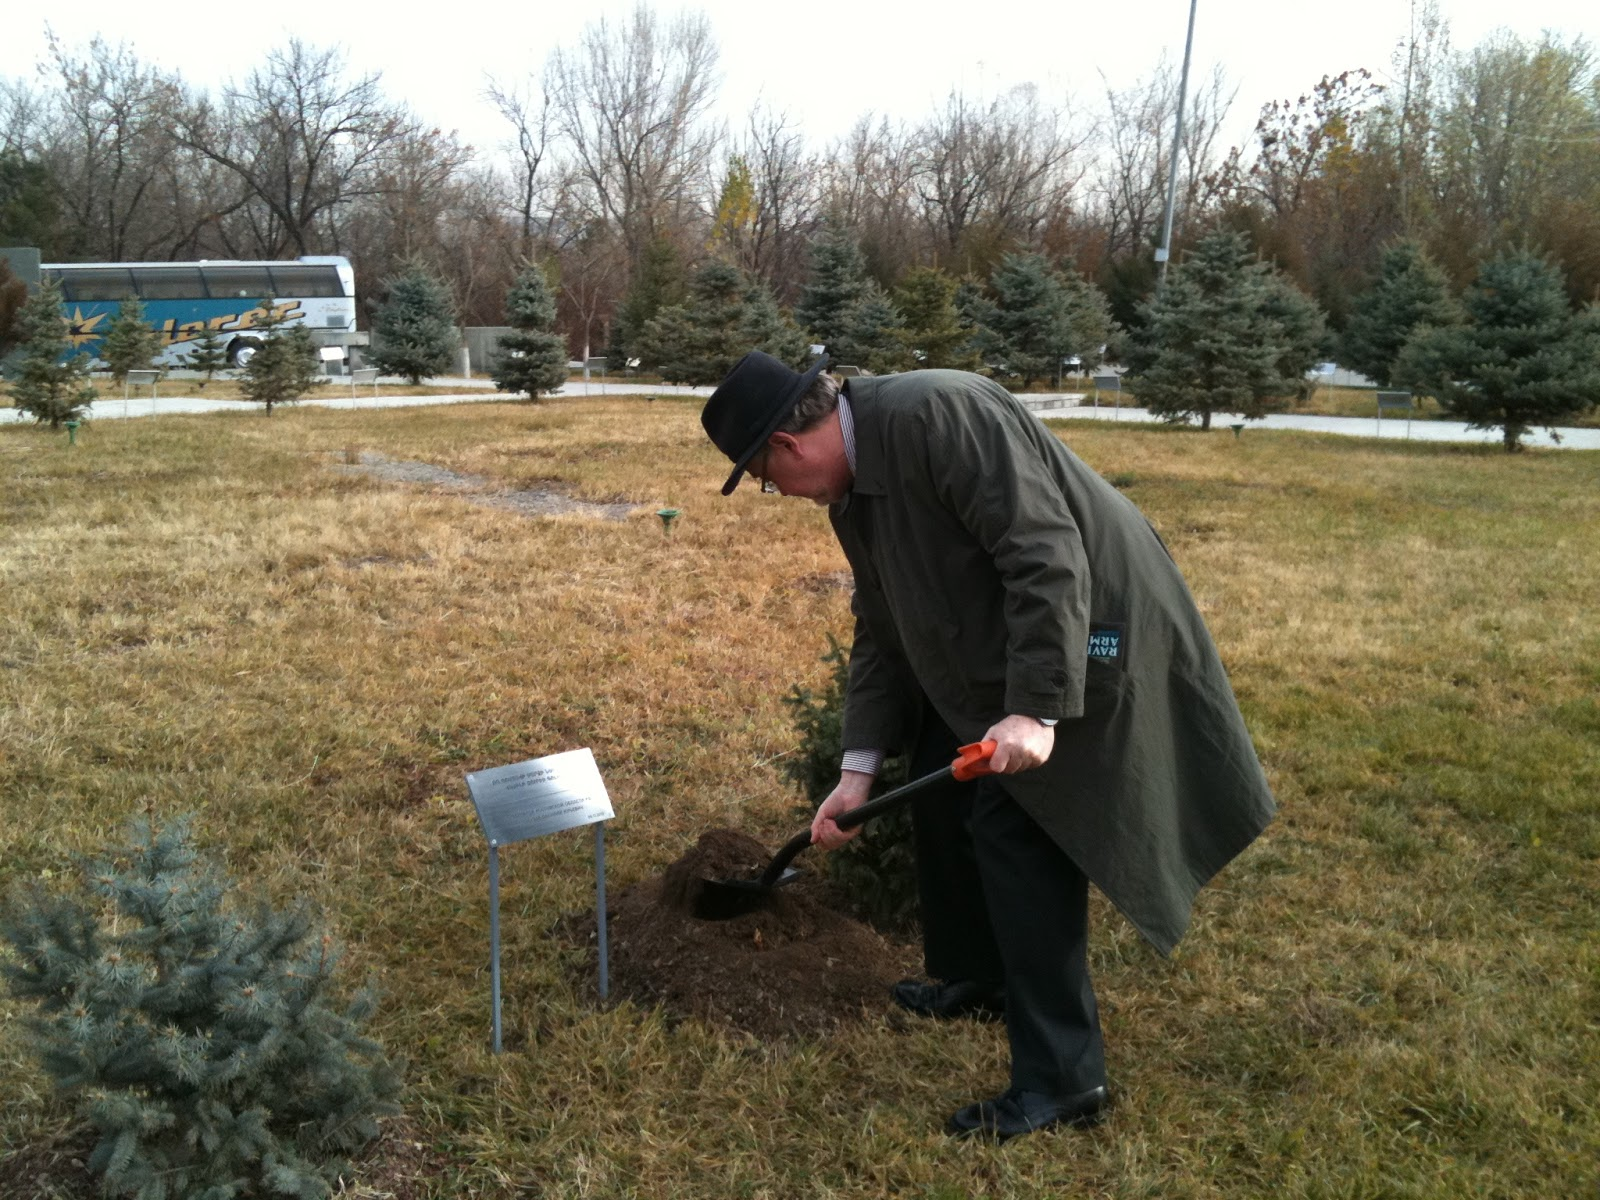 http://4.bp.blogspot.com/_q0ioDxOSoAA/TQhtEizjoYI/AAAAAAAAAtg/sIwRGMPFO24/s1600/tree+planting.JPG